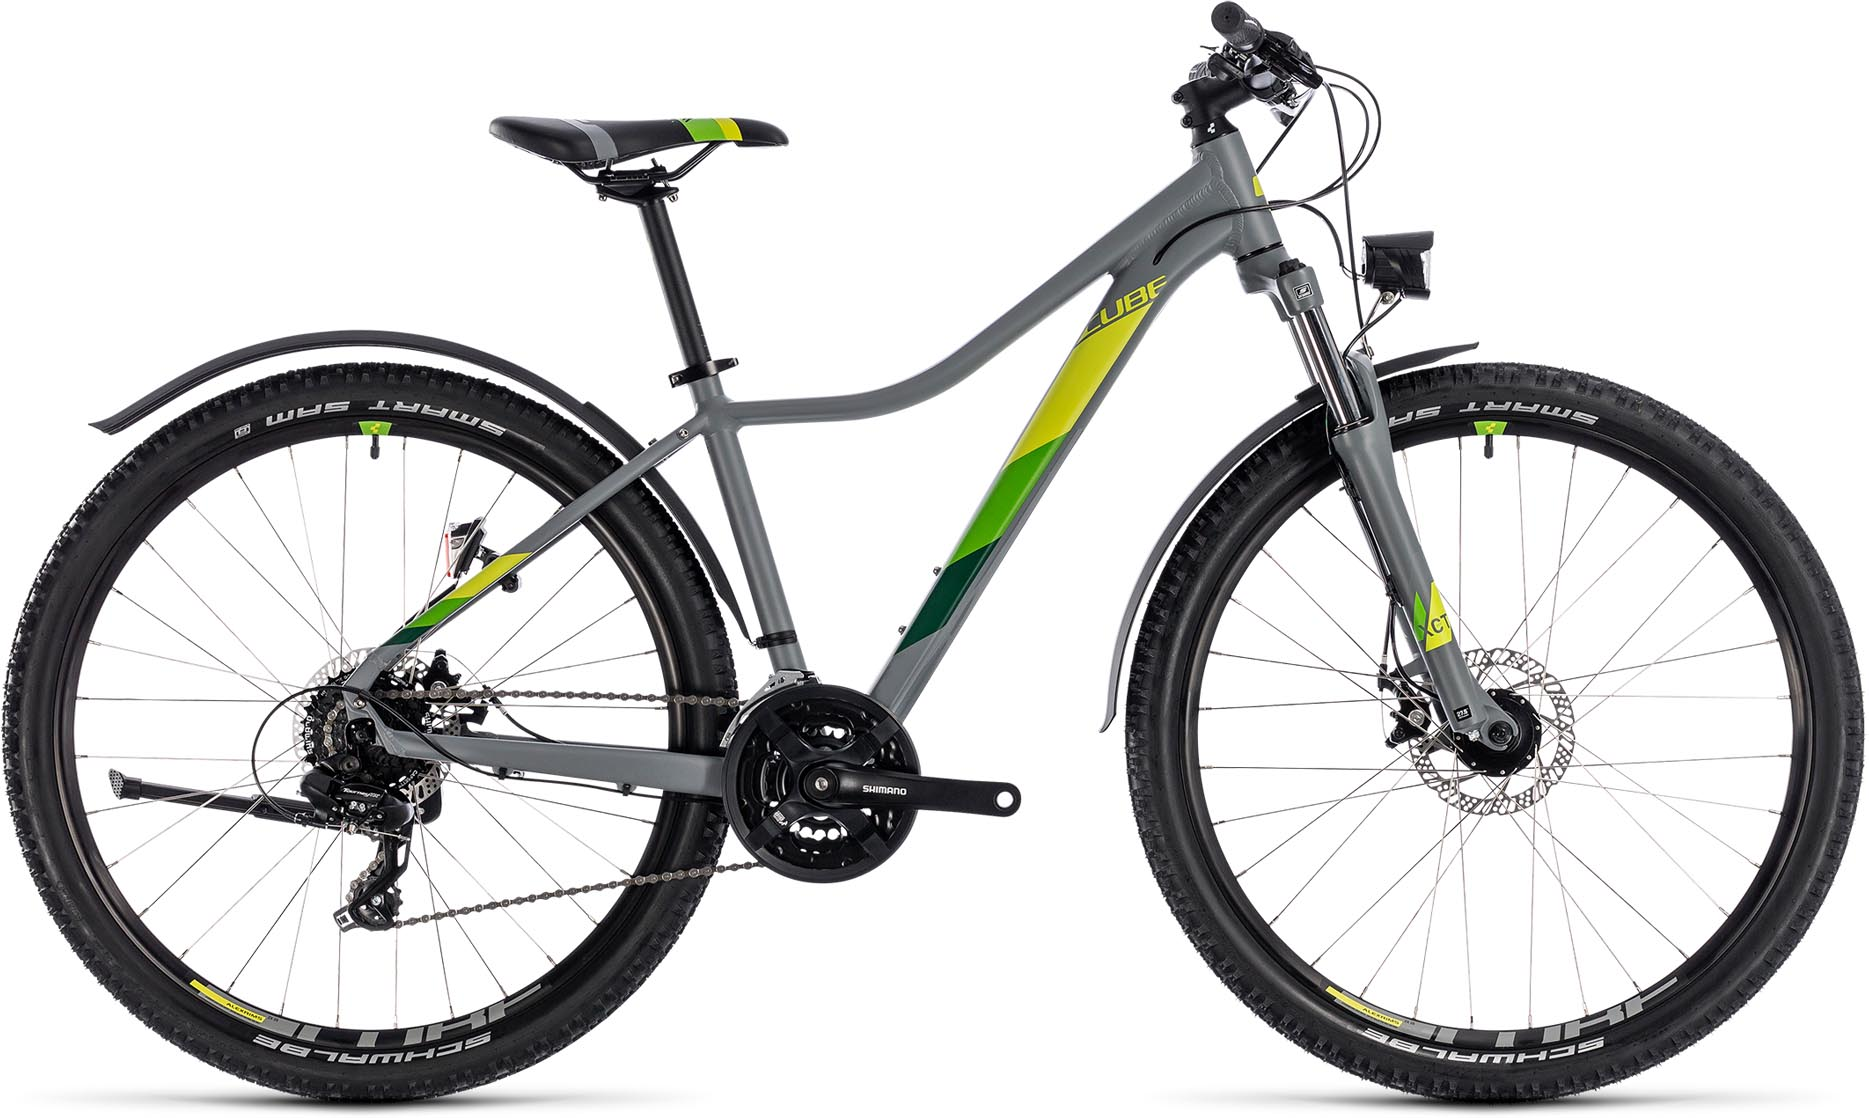 c8e4f67d8df Mountainbikes (Hardtail)   Bikes   Sale   mhw-bike.com - Bikes for all /  The online shop for bicycles, e-bikes, mountain bikes, trekking bikes and  racing ...